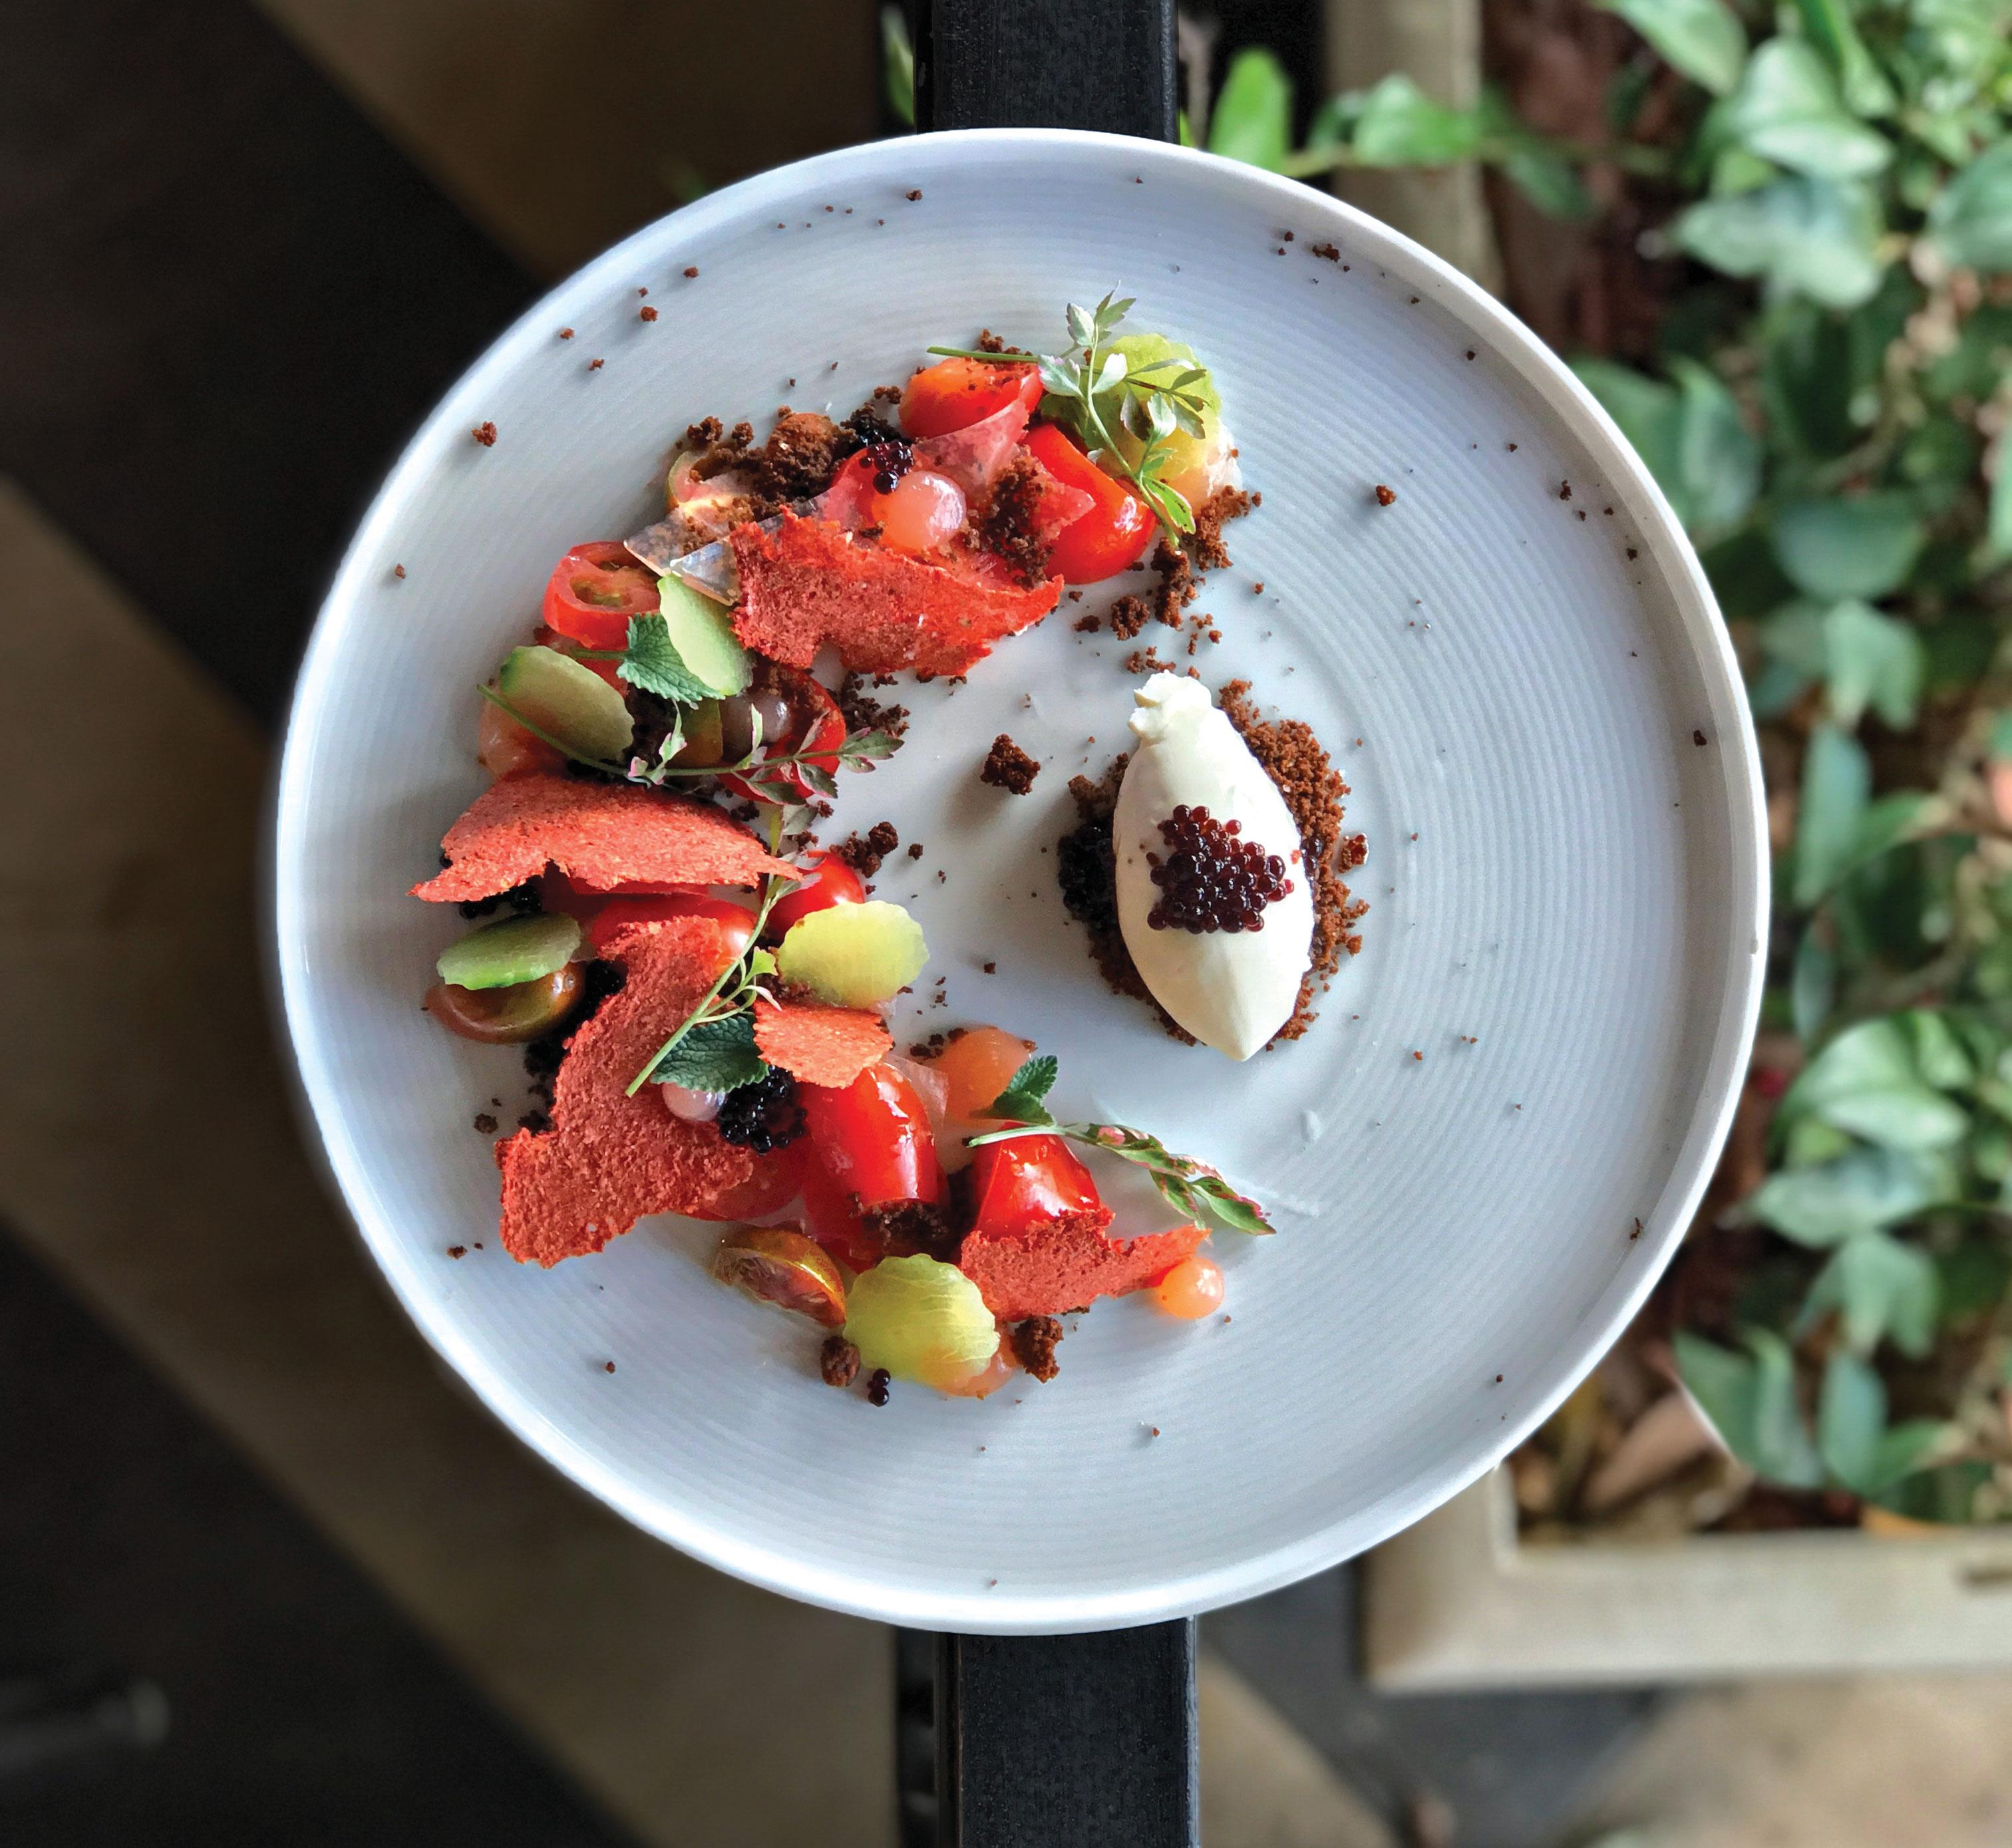 avant rancho bernardo inn heirloom tomato salad with burrata and pumpernickel